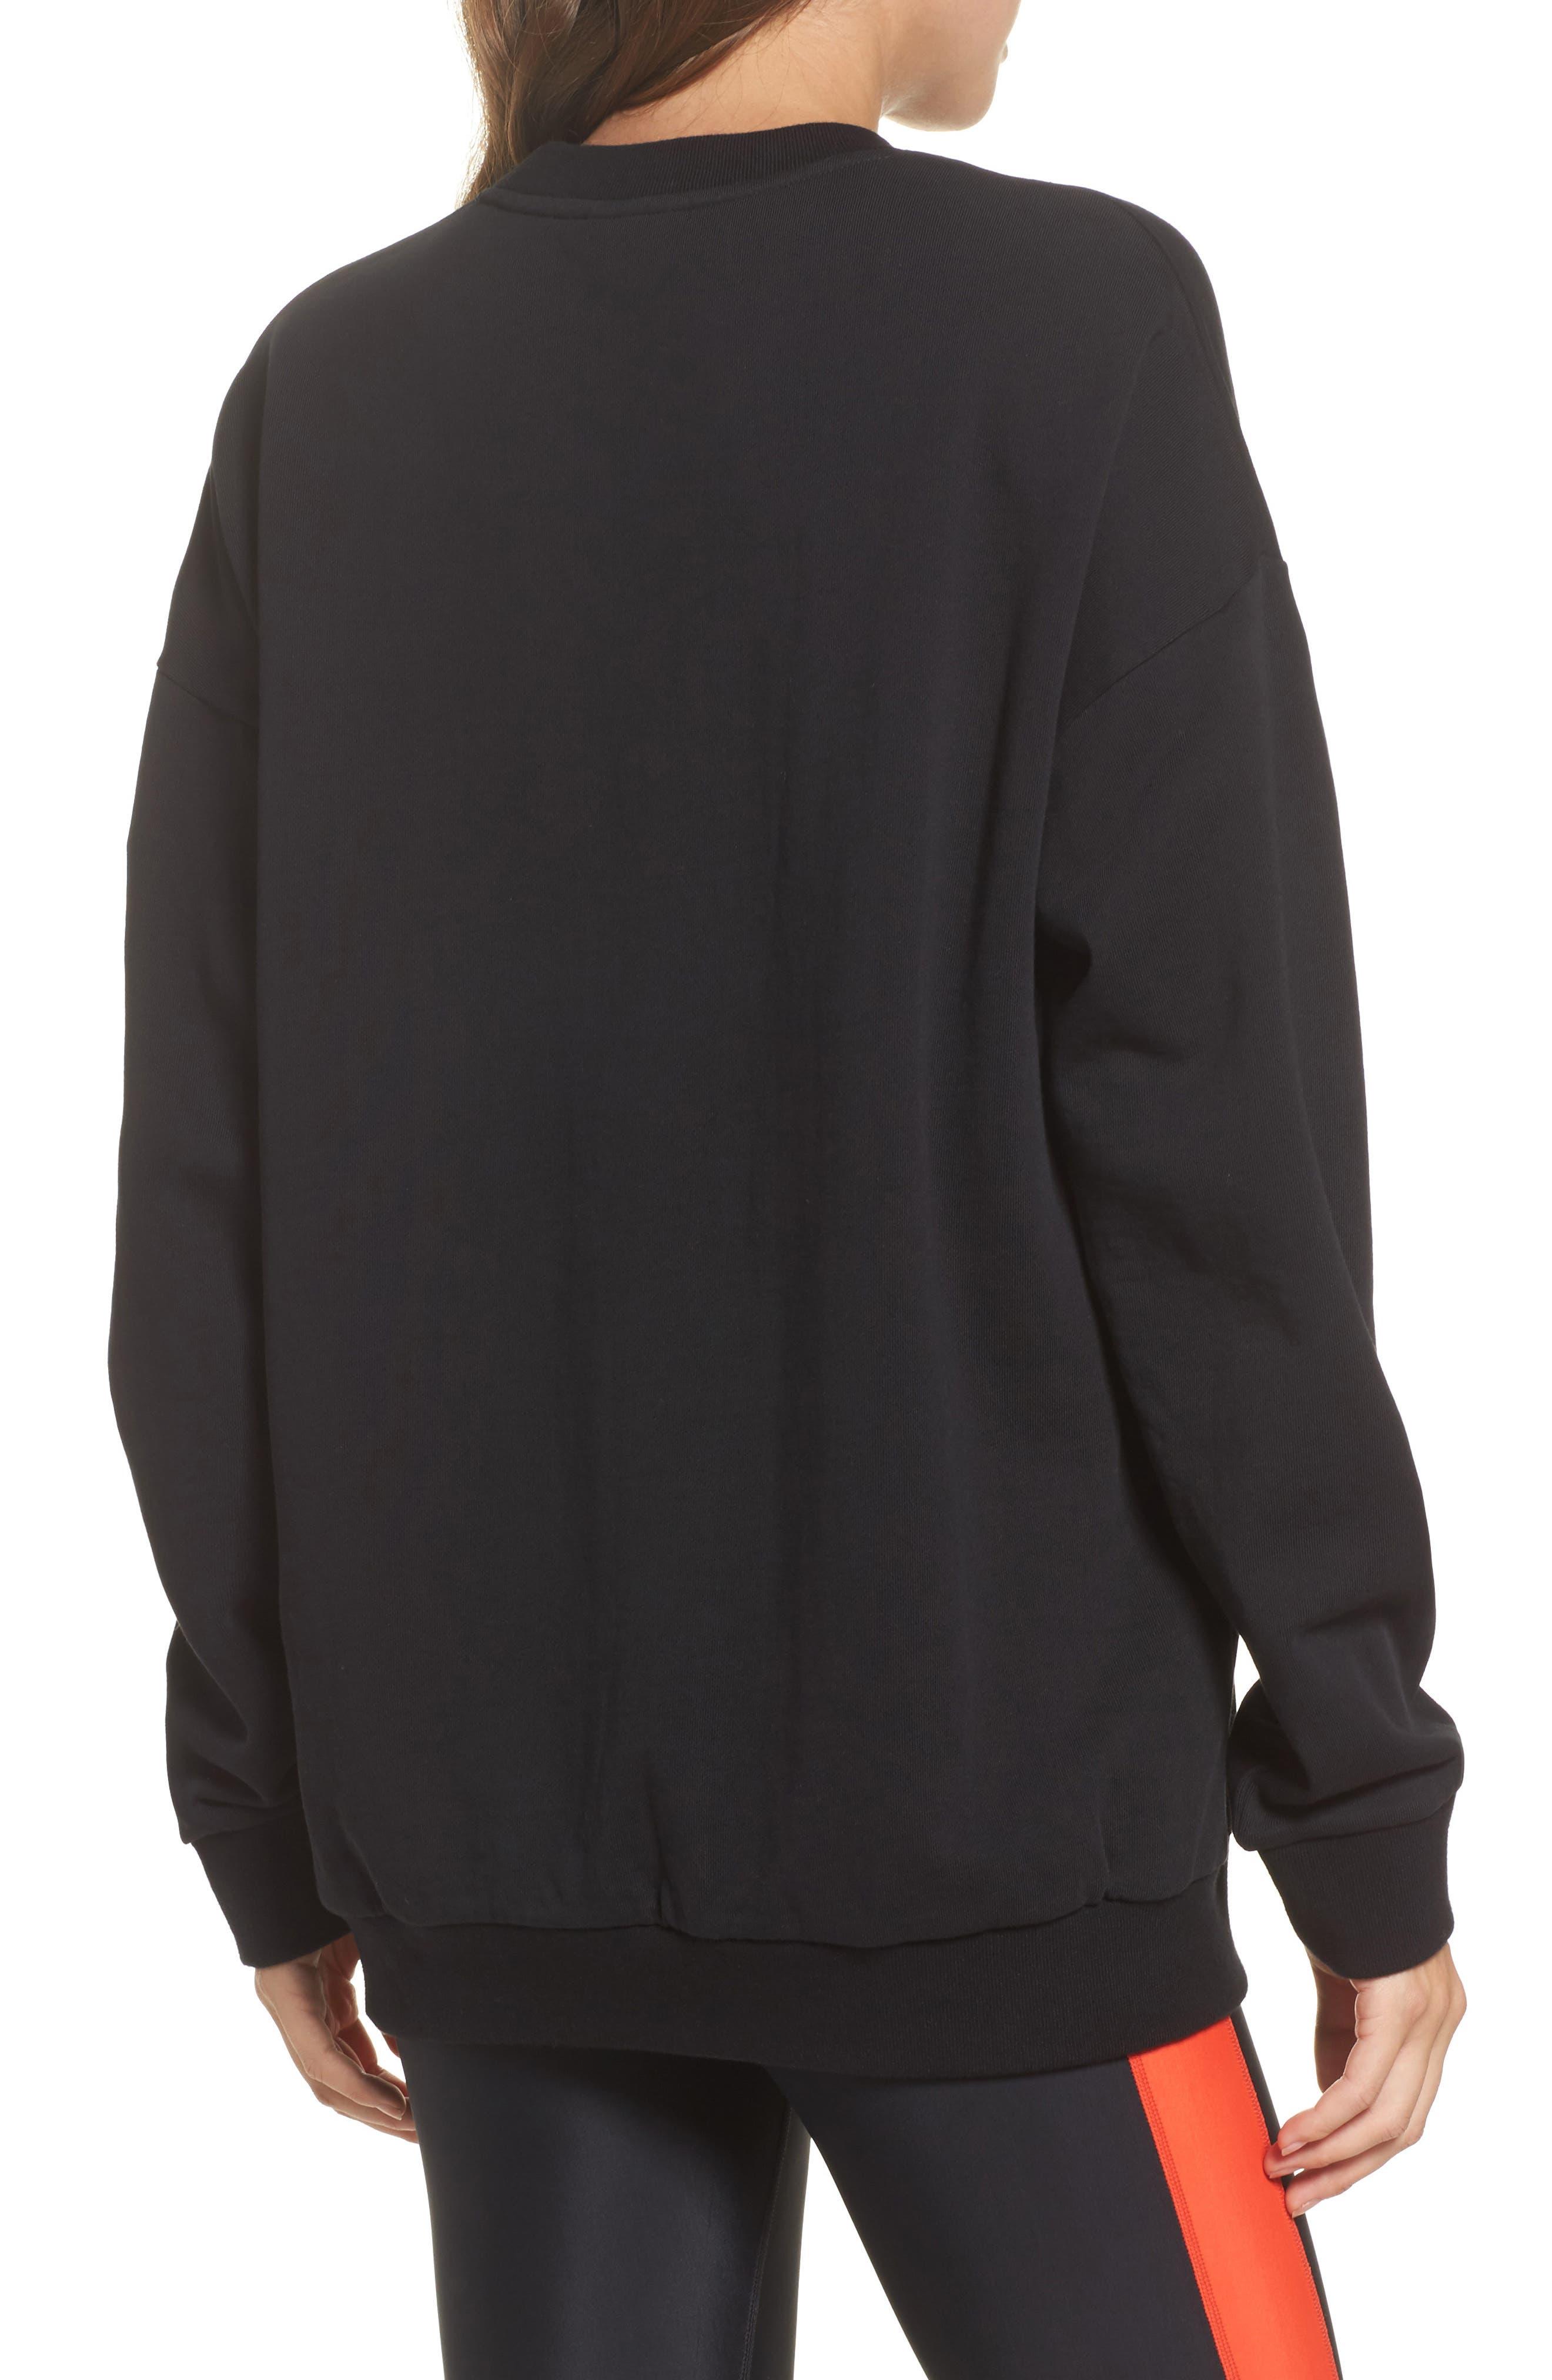 Get Set Sweatshirt,                             Alternate thumbnail 2, color,                             Black